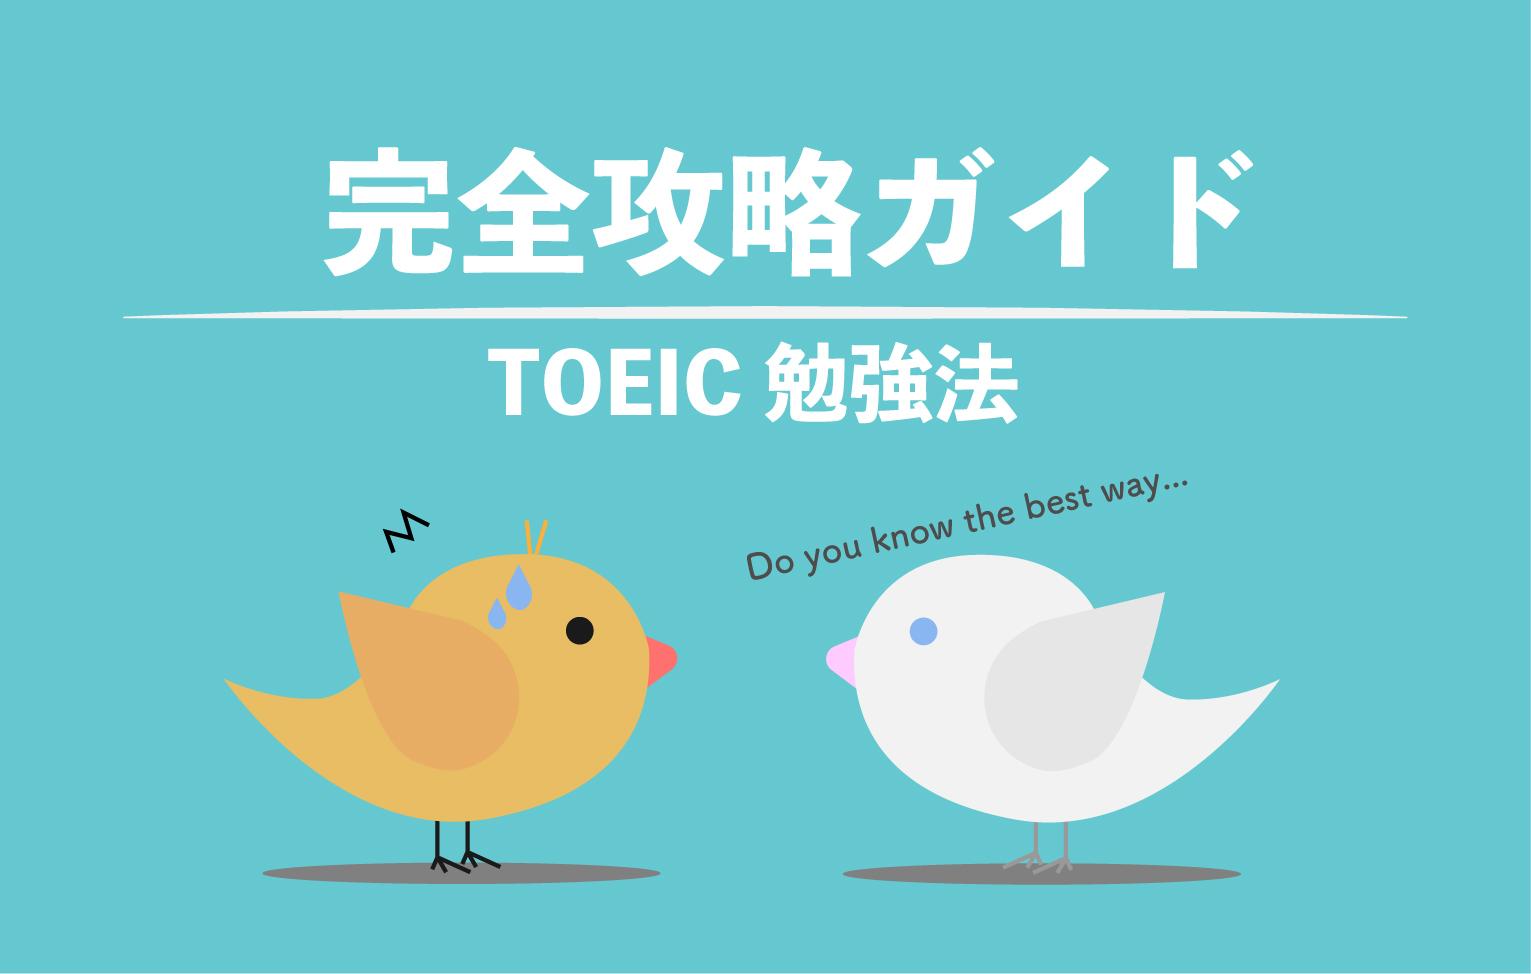 【TOEIC】勉強法の完全攻略ガイド 【無料公開中】